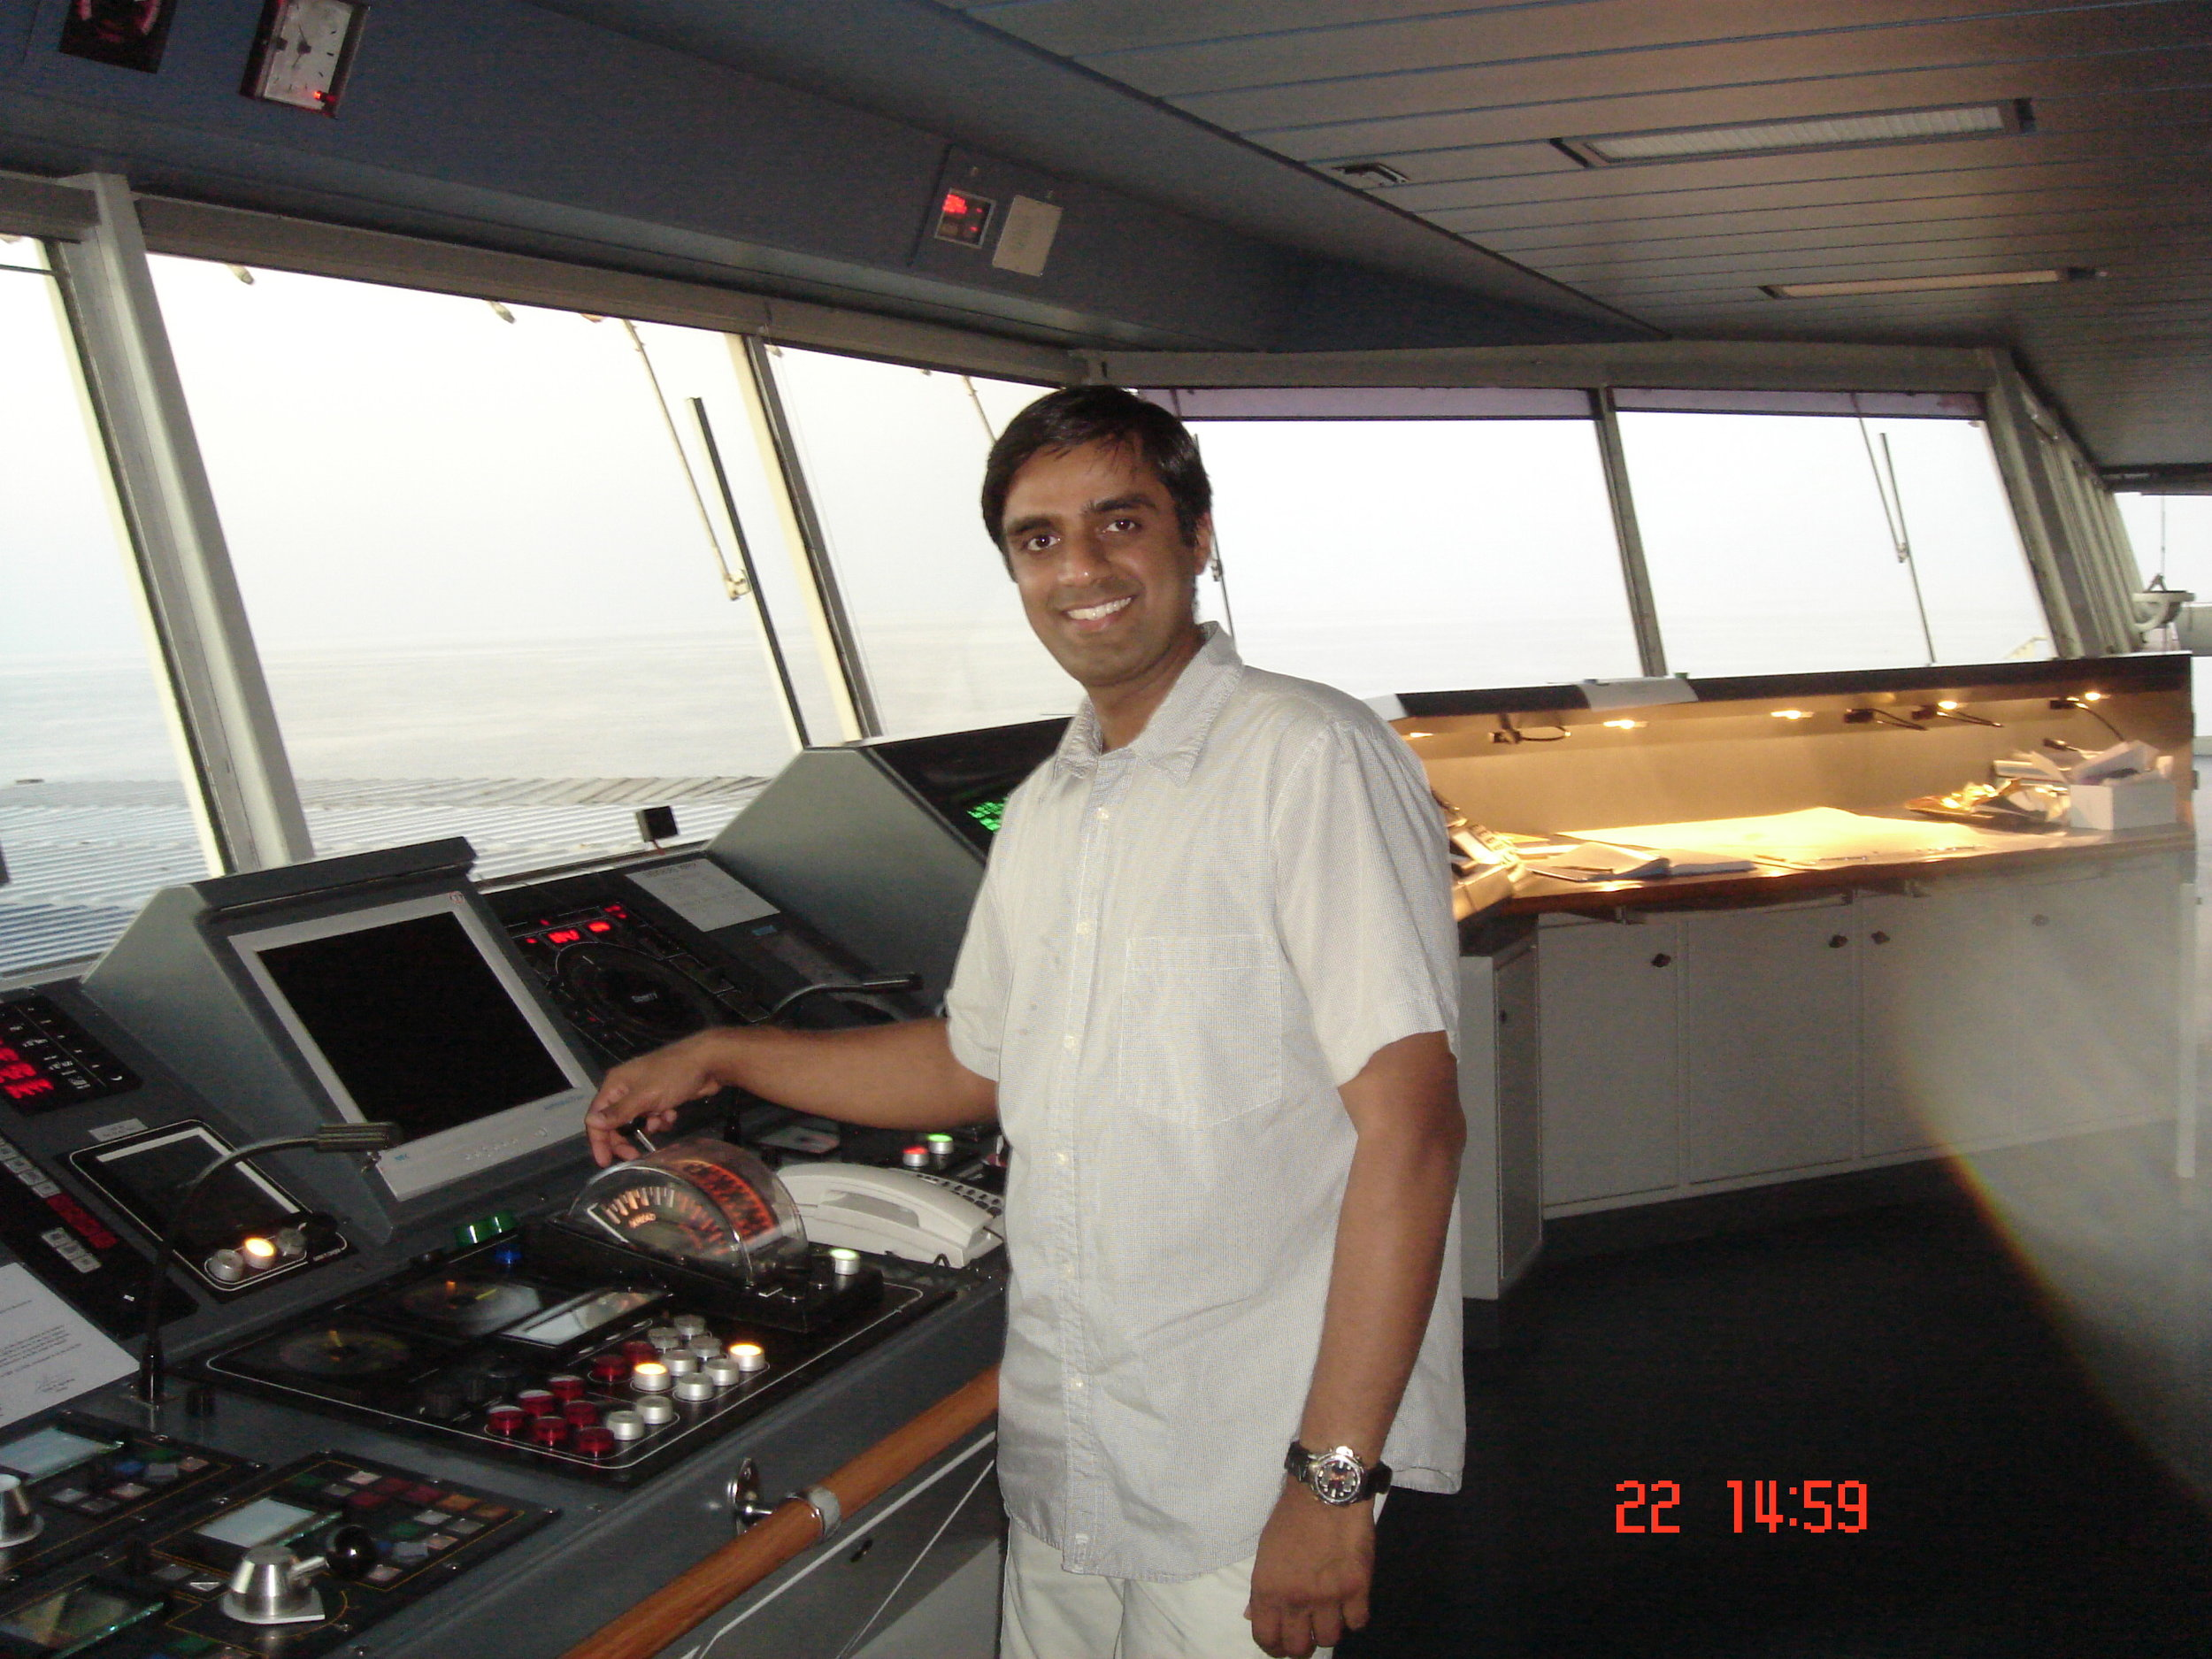 Vivek Menon when has was sailing as junior officer.